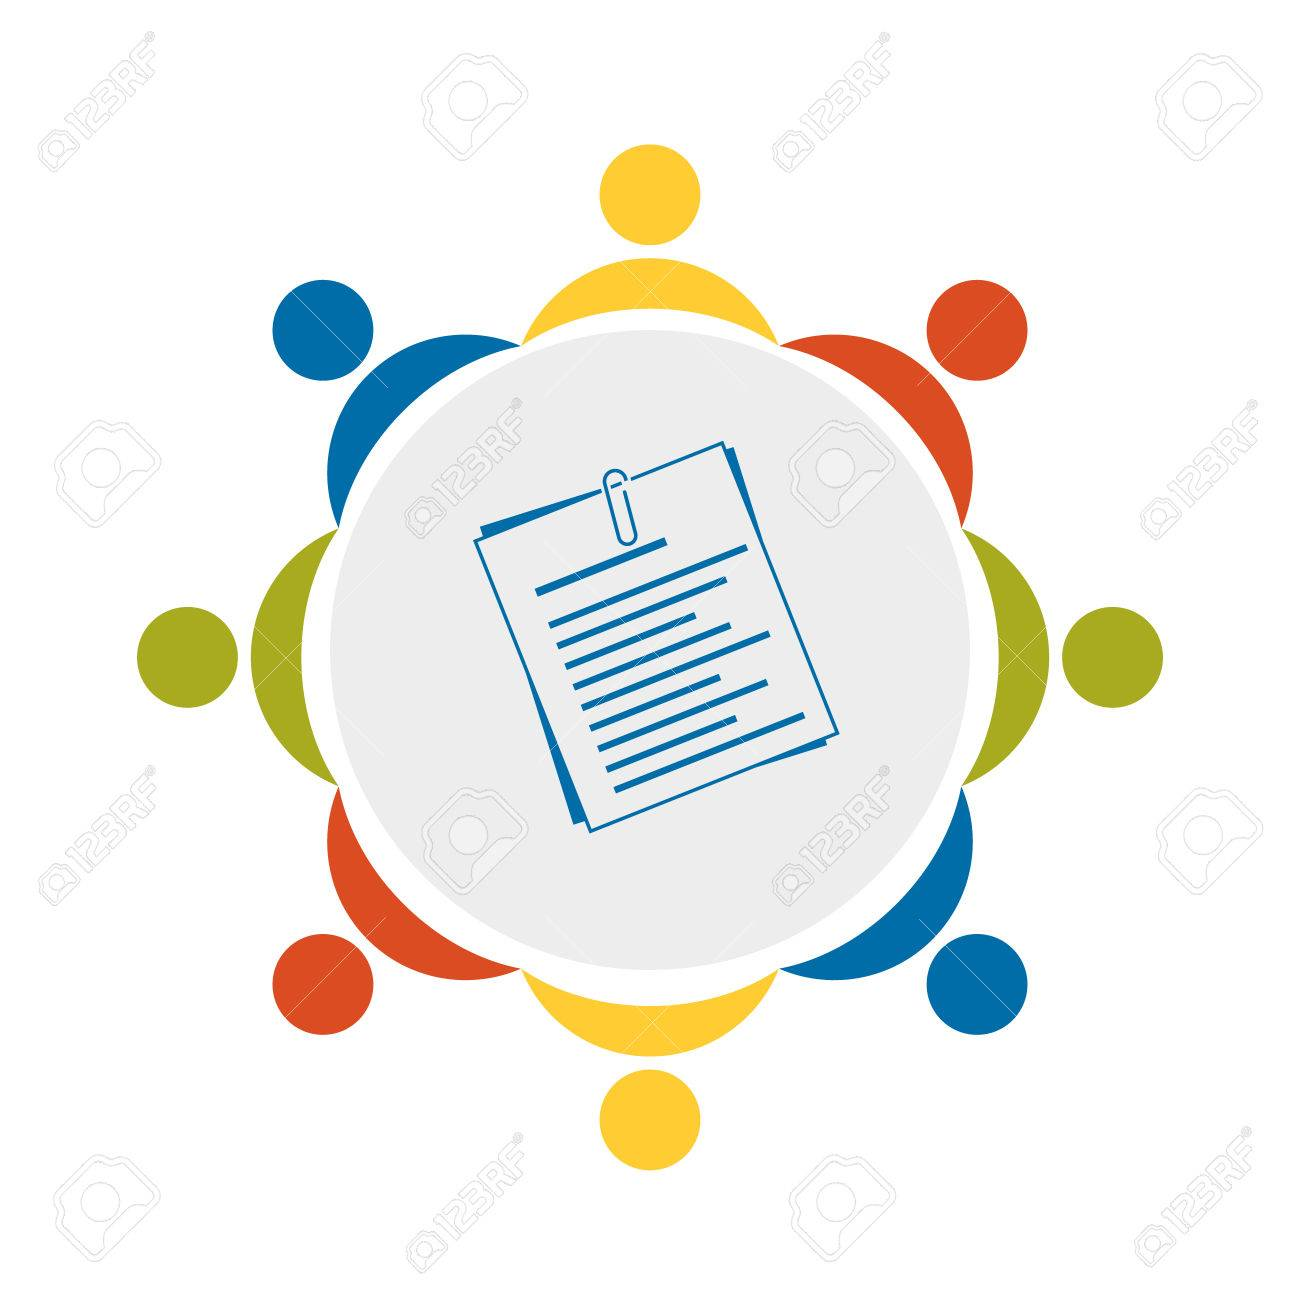 teamwork icon symbol of teambulding documents resume meeting